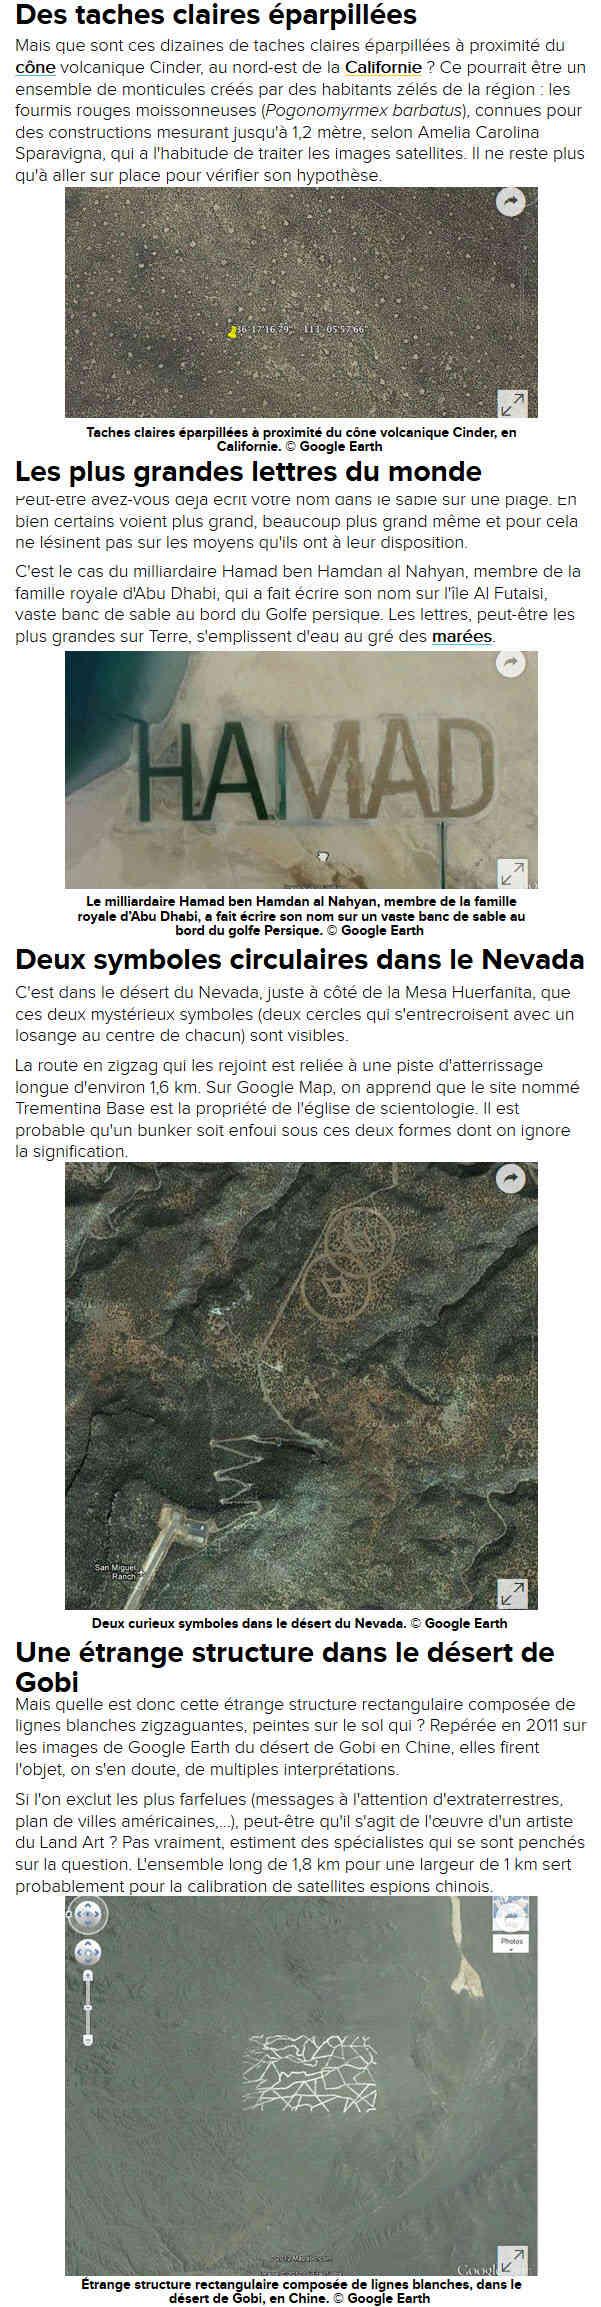 FUTURA Actu et Google Earth 7710